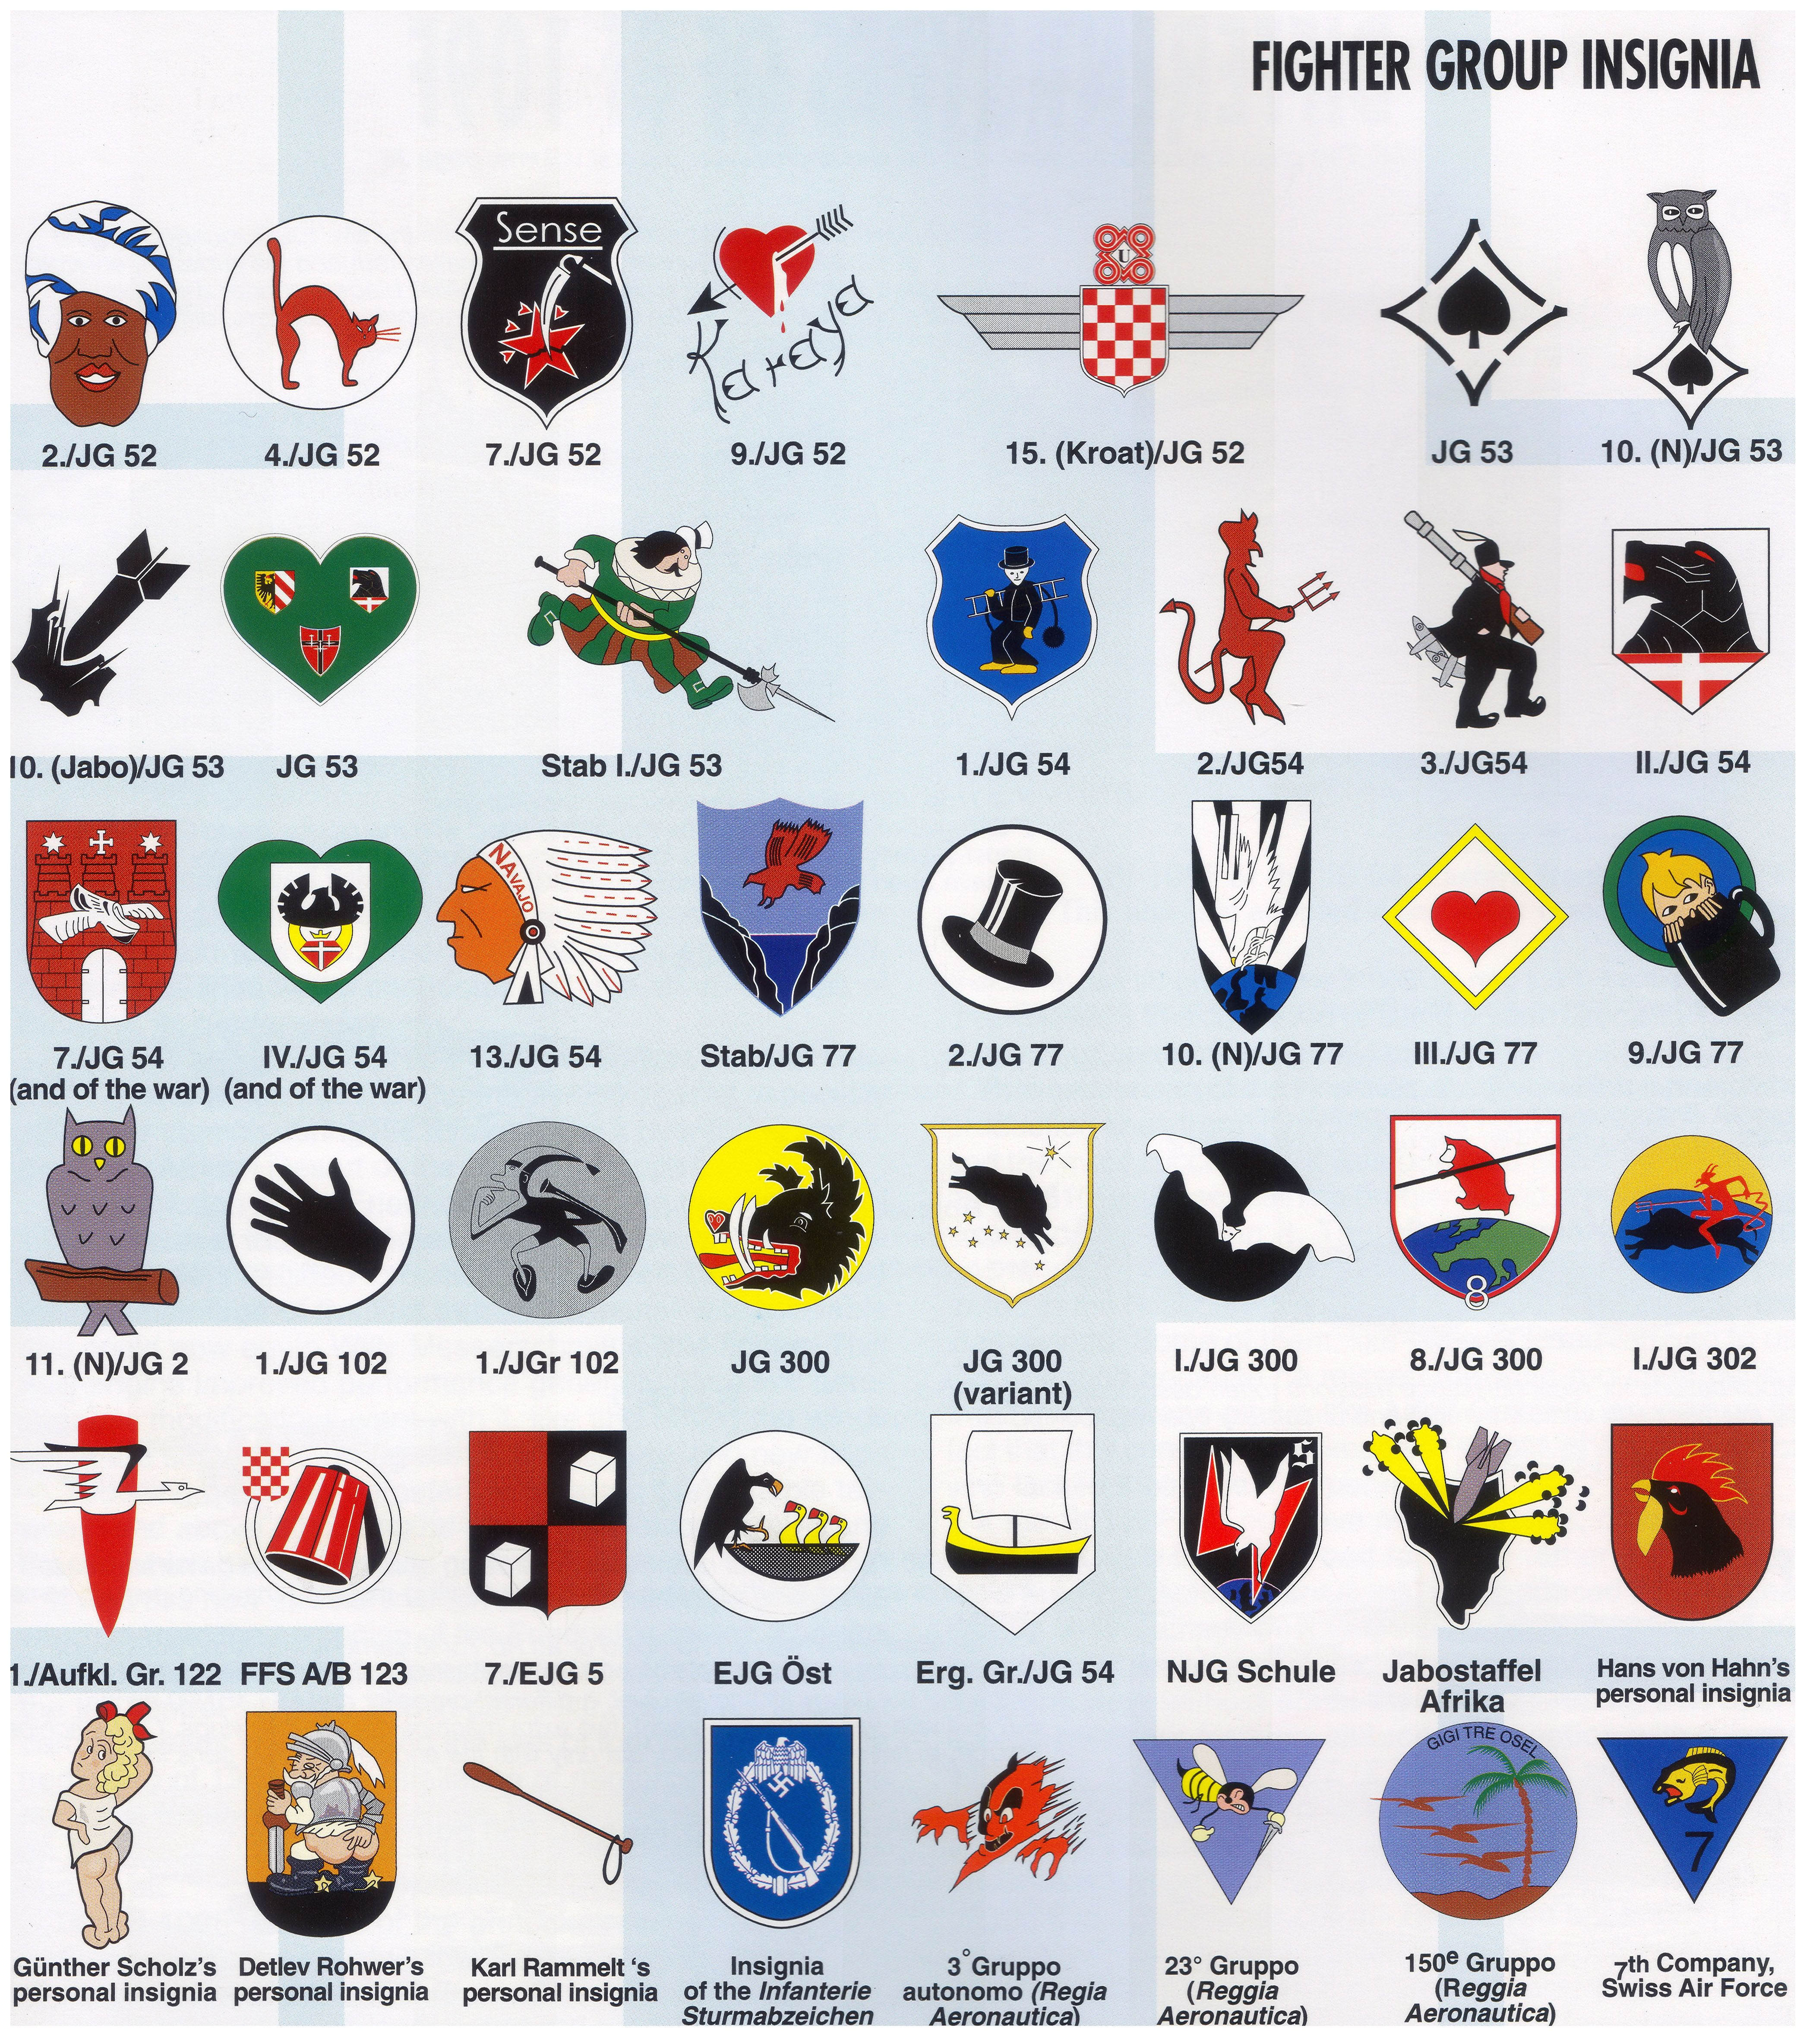 Luftwaffe fighter group (Geschwader, Gruppe, and Staffel) insignia. Very Little Nazi influence on the design